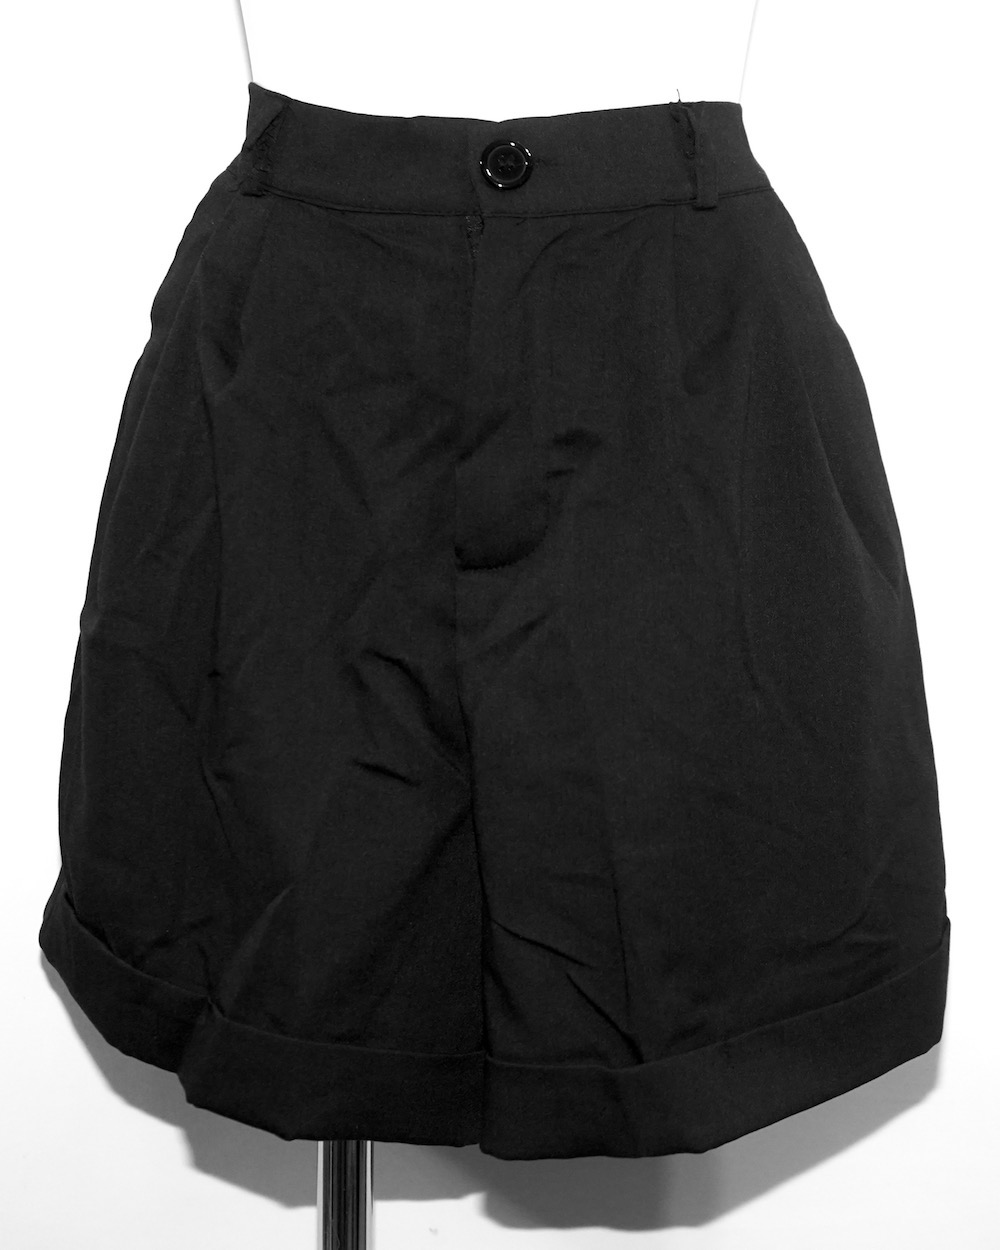 High-Waist Tuck Short Slacks (black)